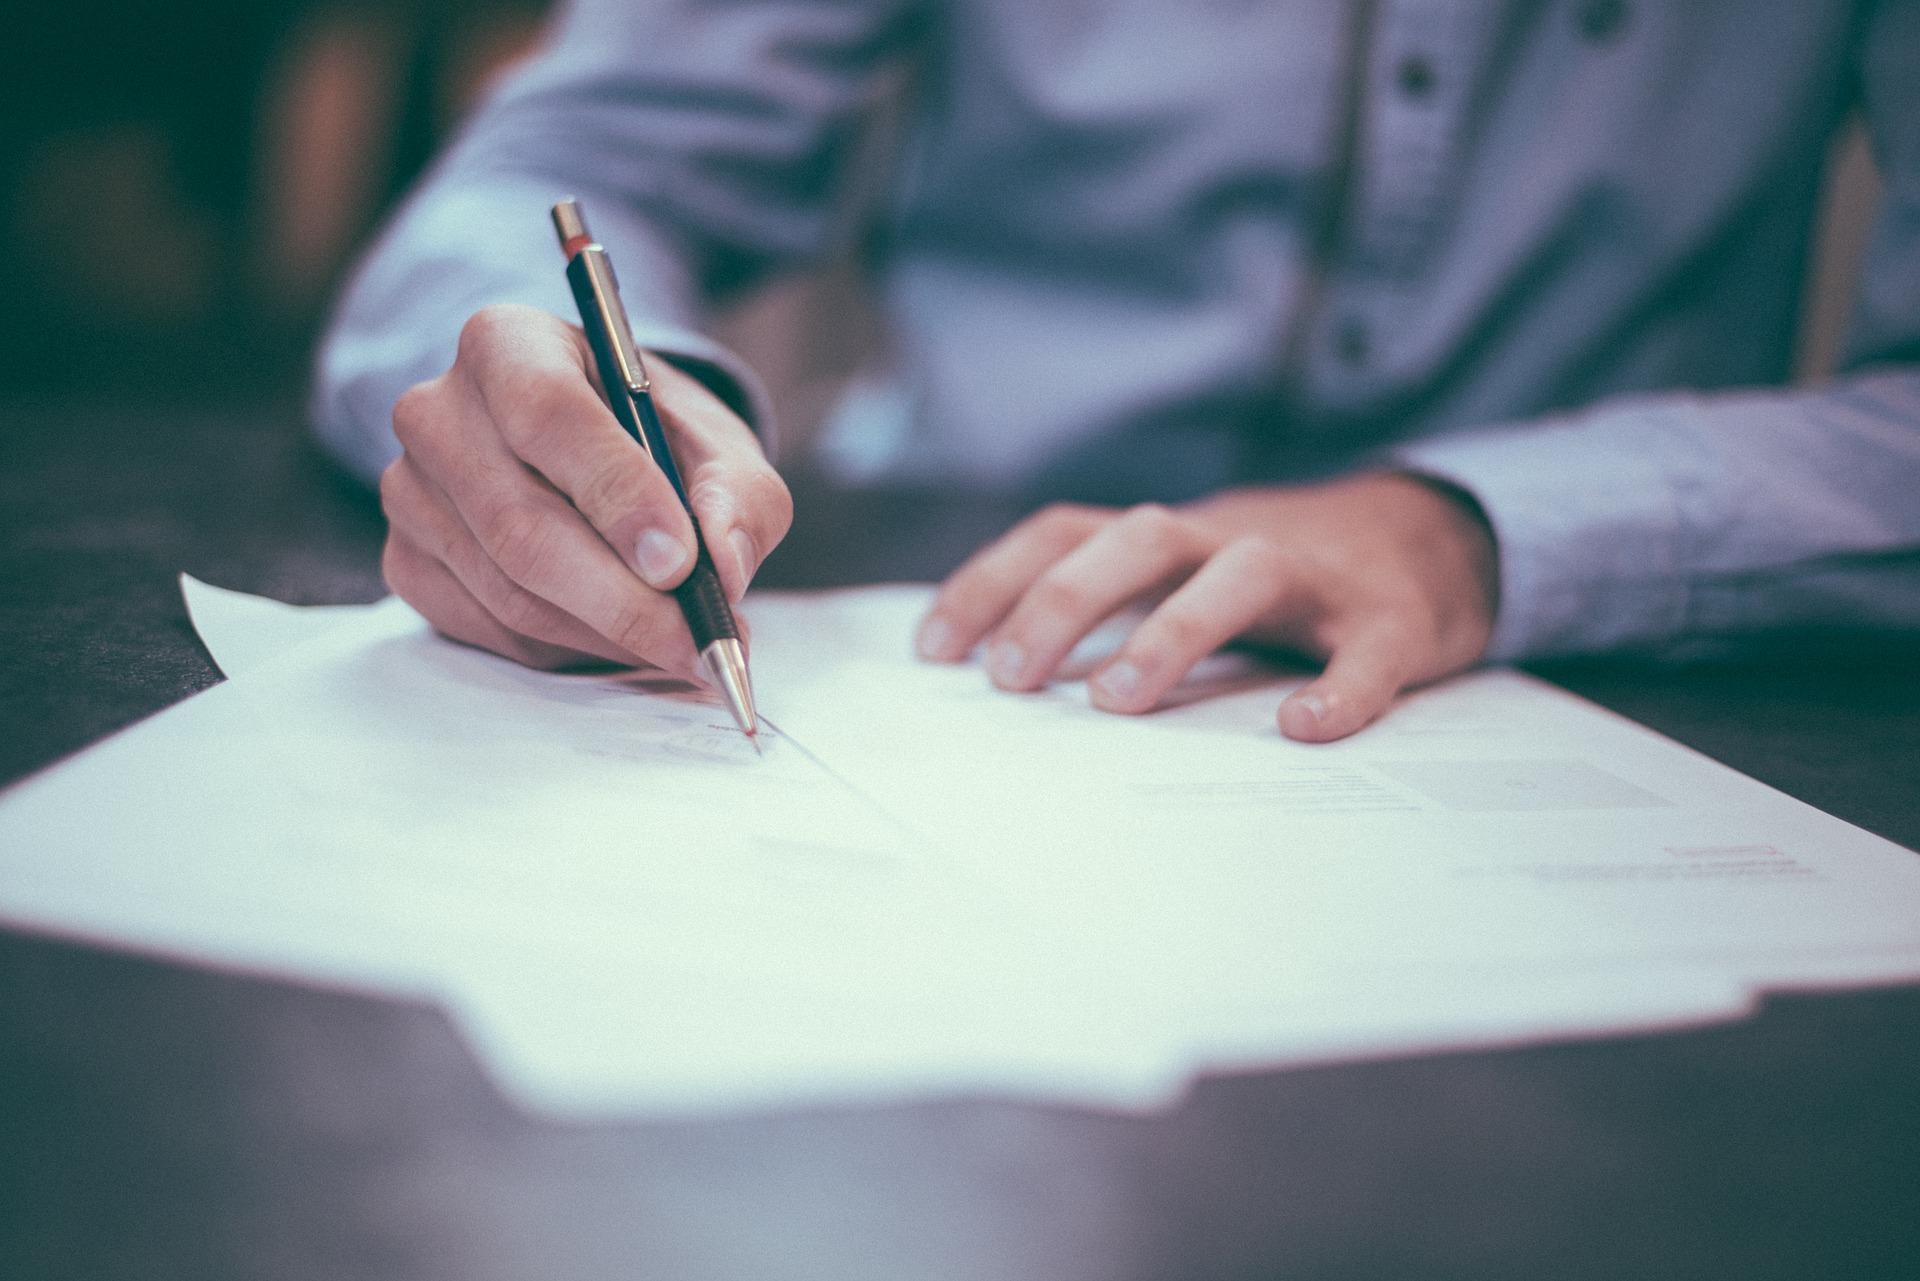 Documento para cobrar seguro de cesantía